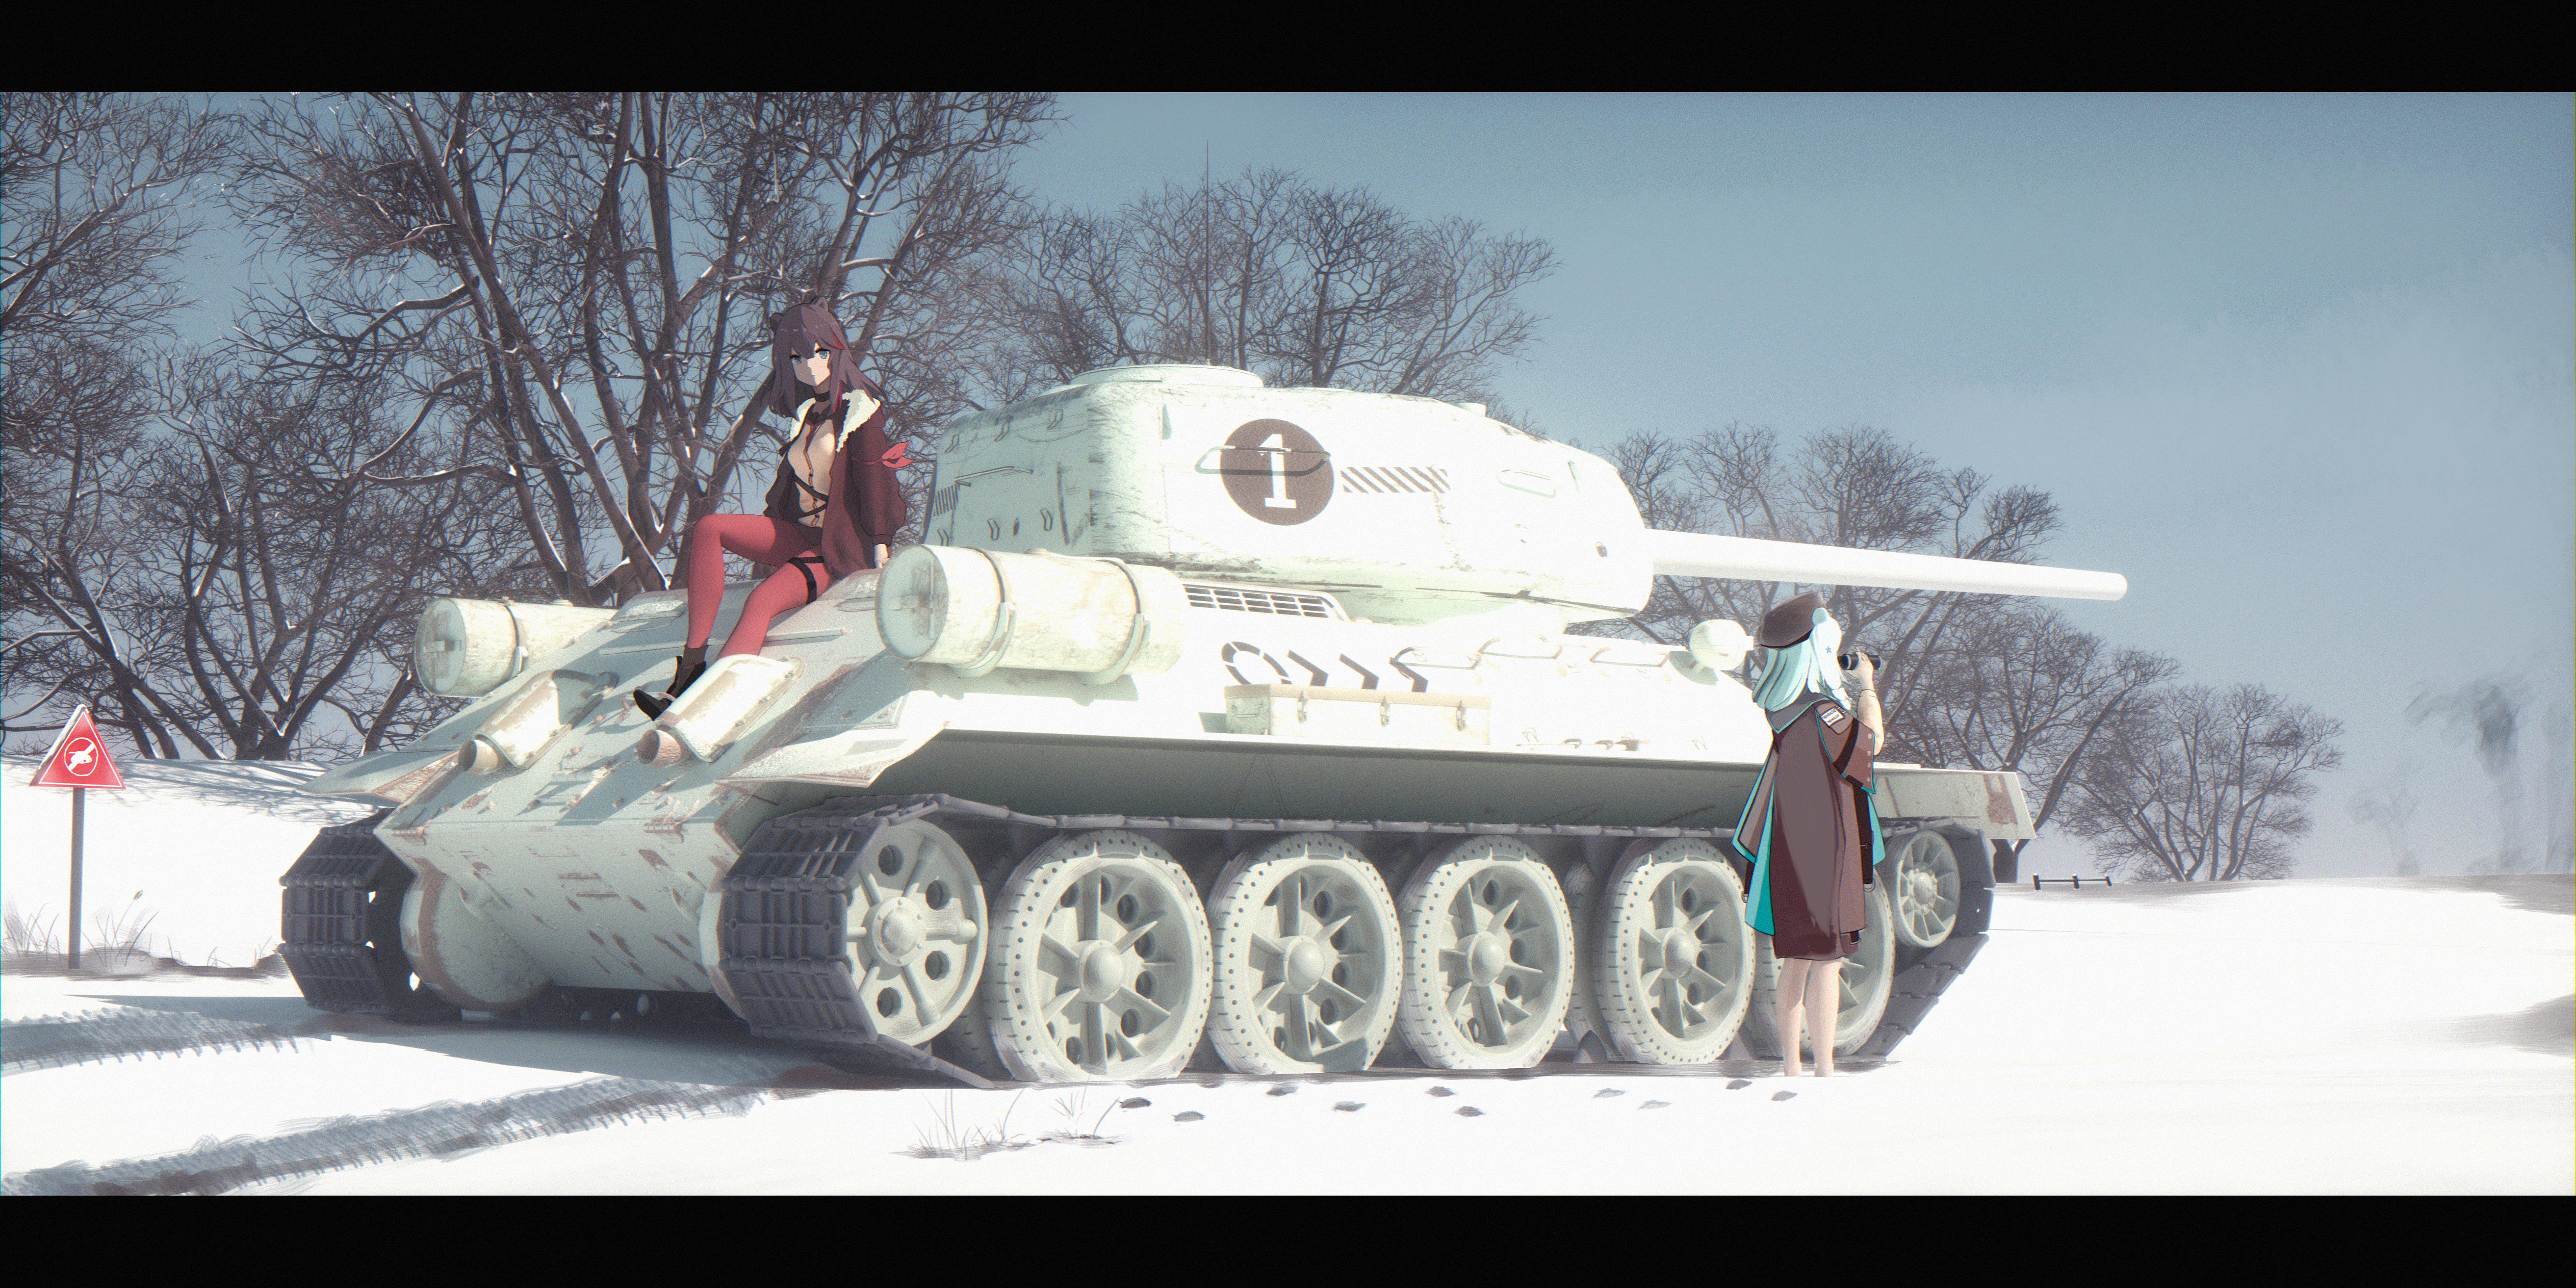 Anime 6400x3200 anime girls Bangeningmeng anime Arknights Zima (Arknights) tank T-34-85 T-34/85 Istina (Arknights)